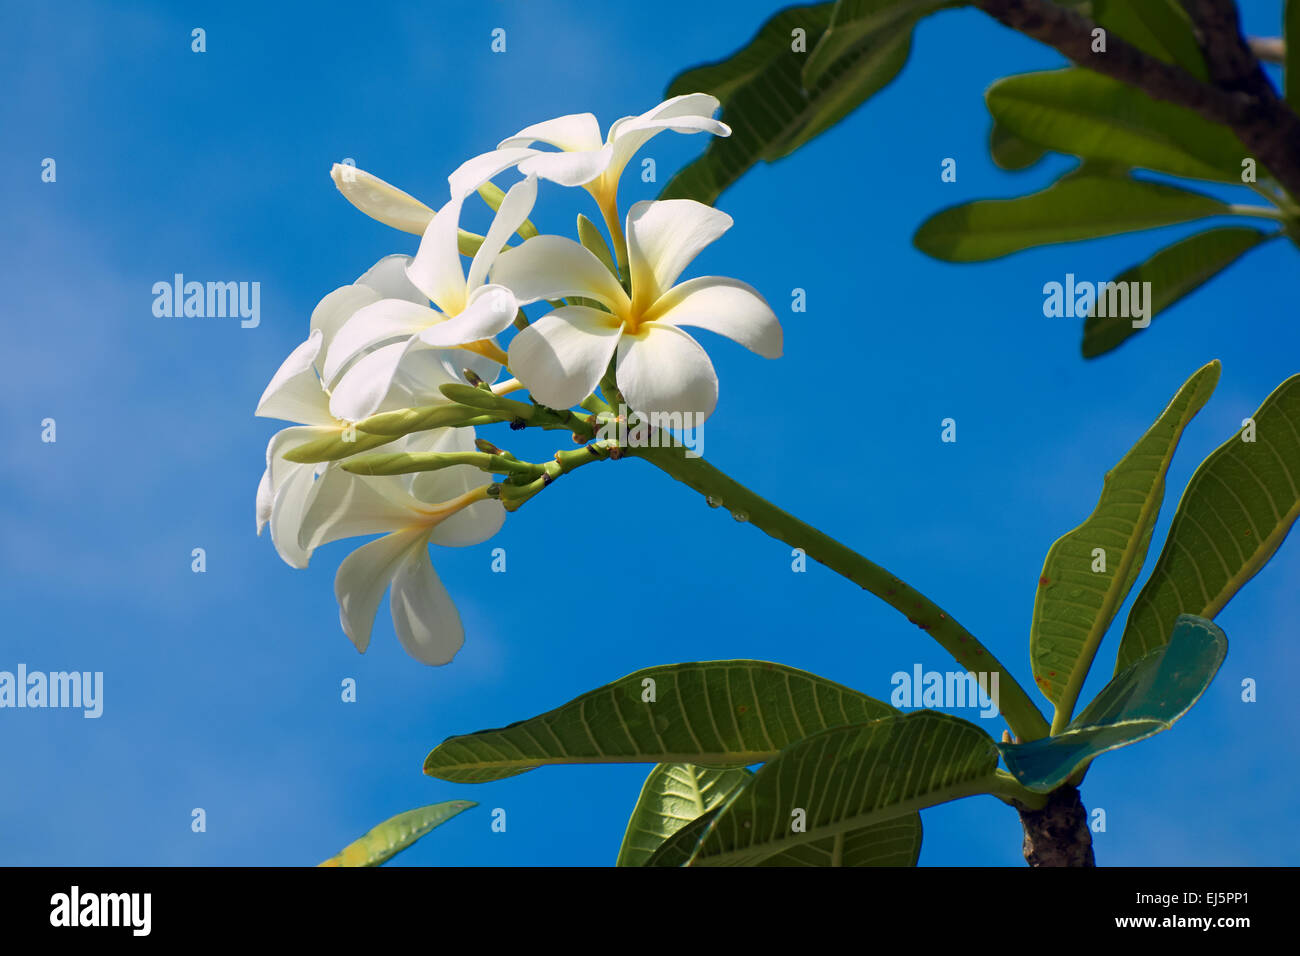 White Frangipani flowers upon blue sky. Scientific name: Plumeria obtusa. Phu Quoc island, Kien Giang Province, - Stock Image